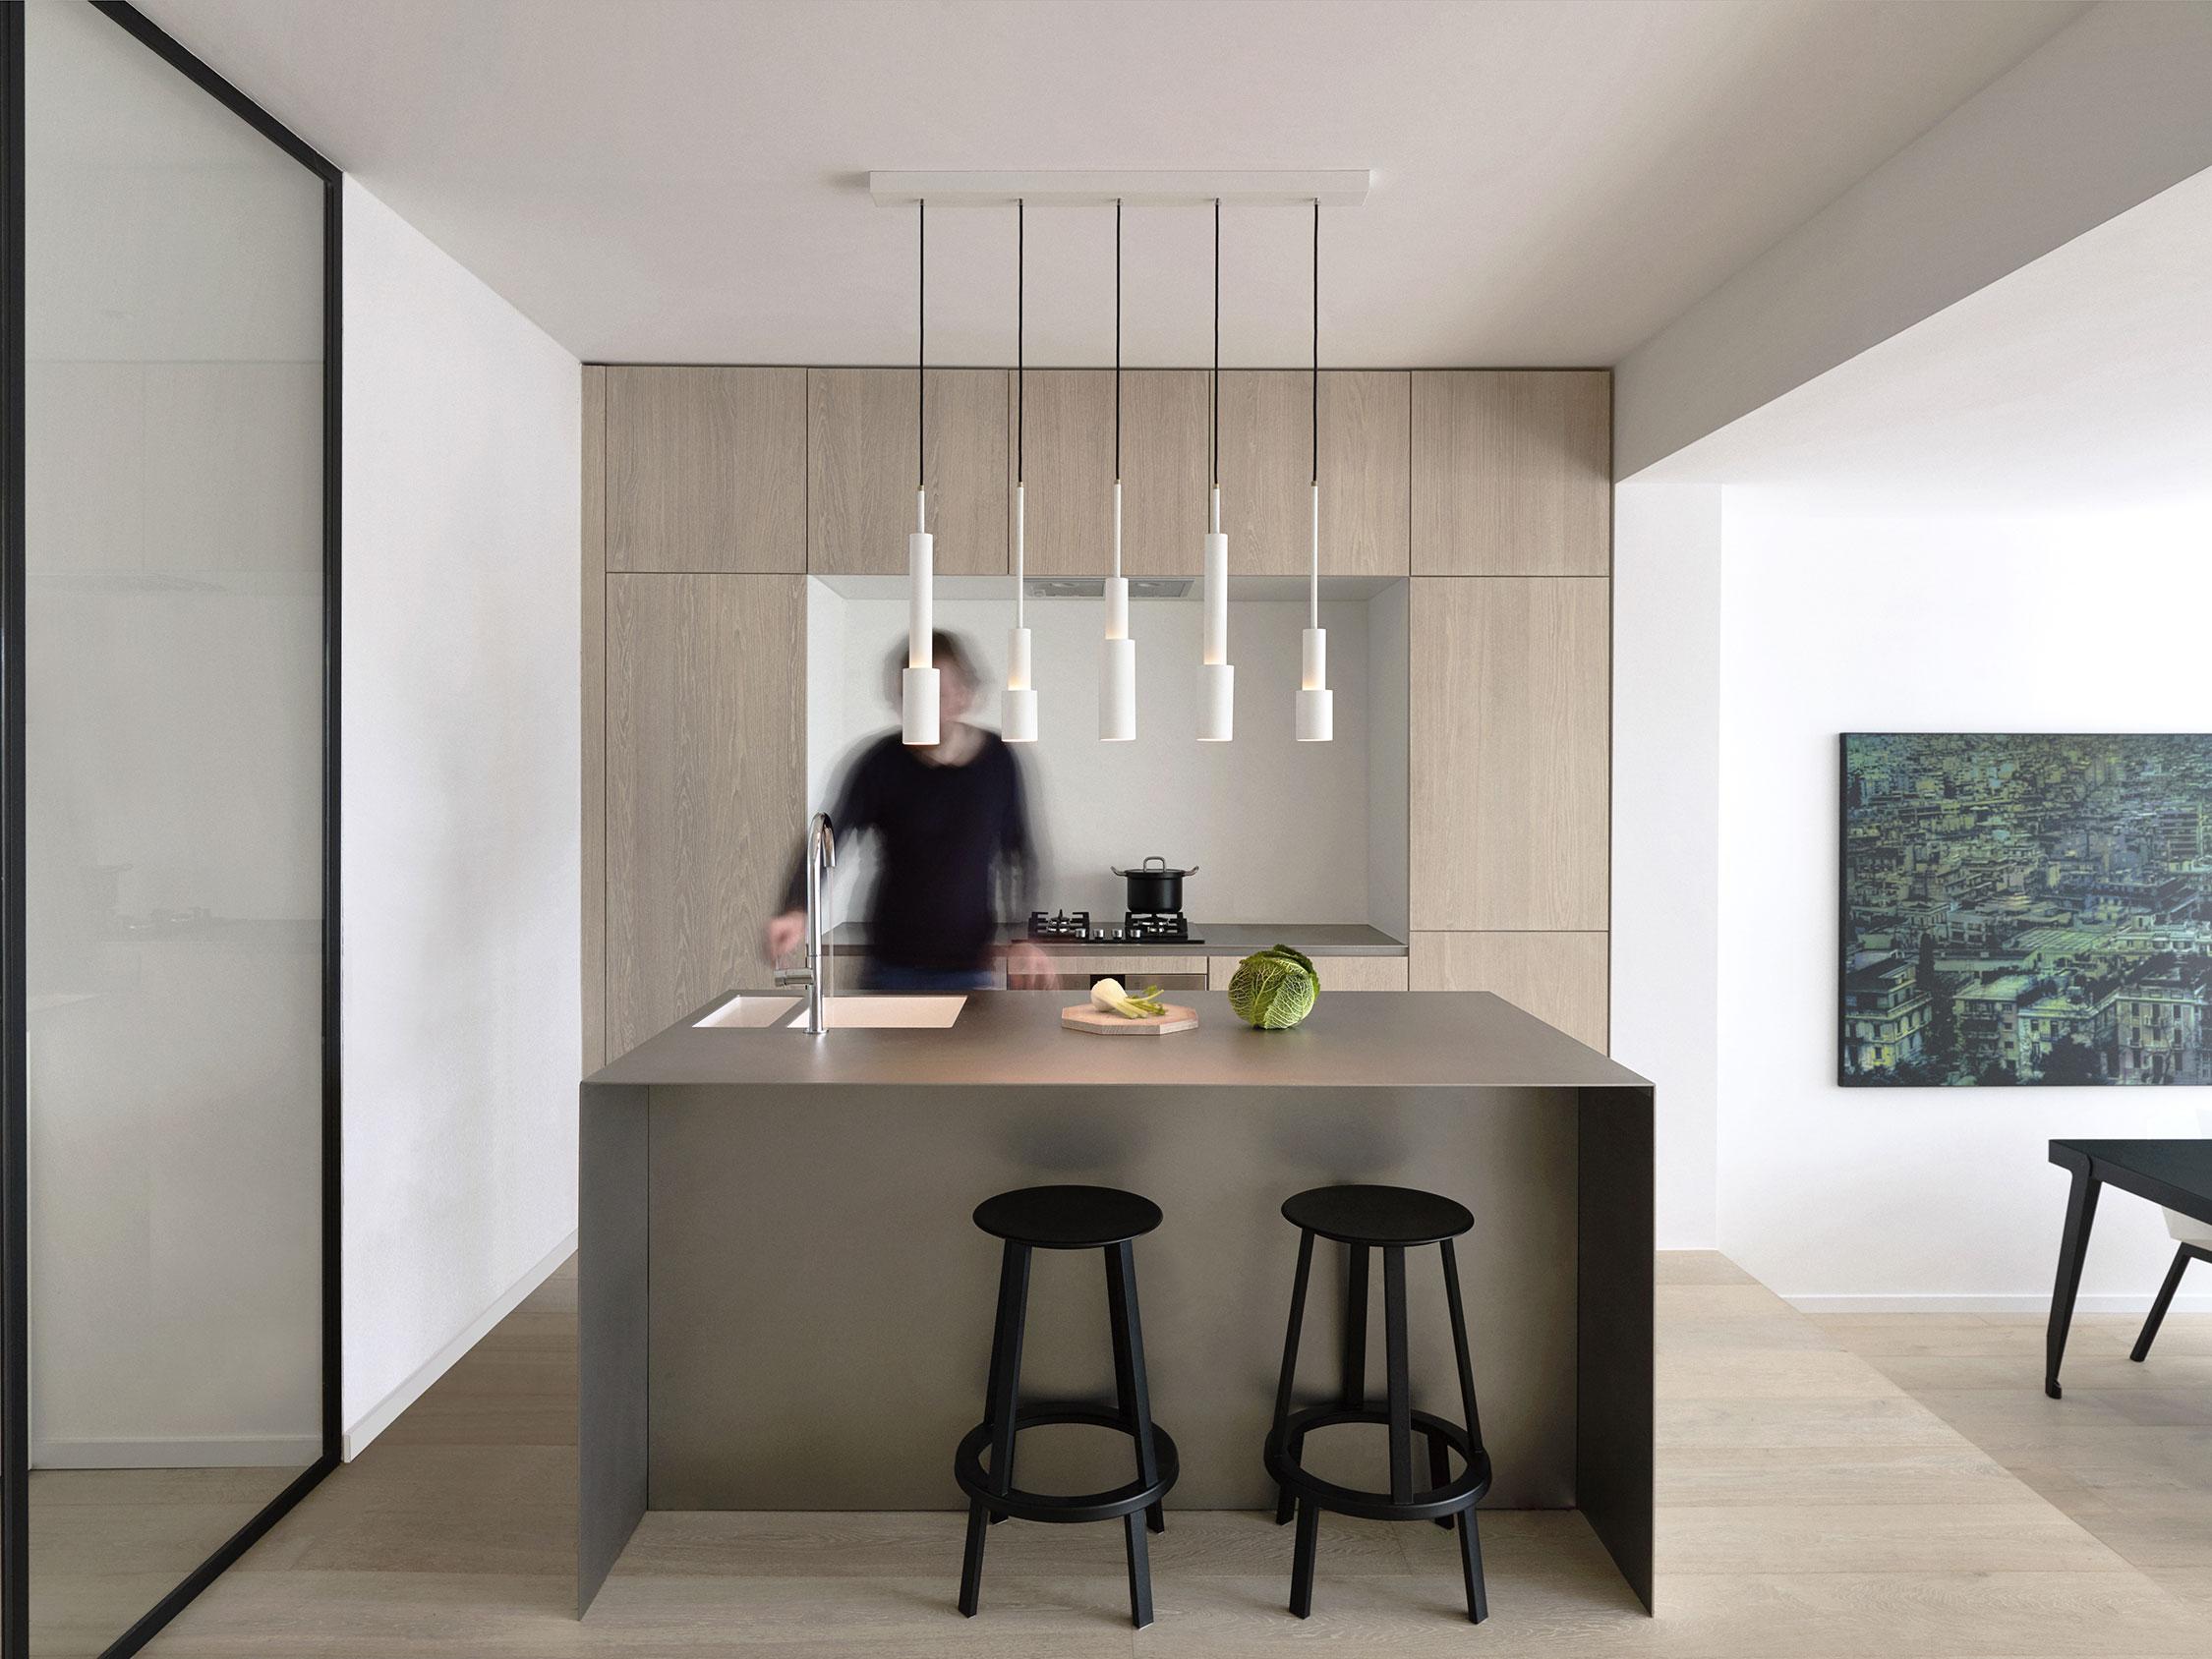 Frederik roij skylight hanglamp kopen gimmii verzendt gratis for Interieur stylist amsterdam